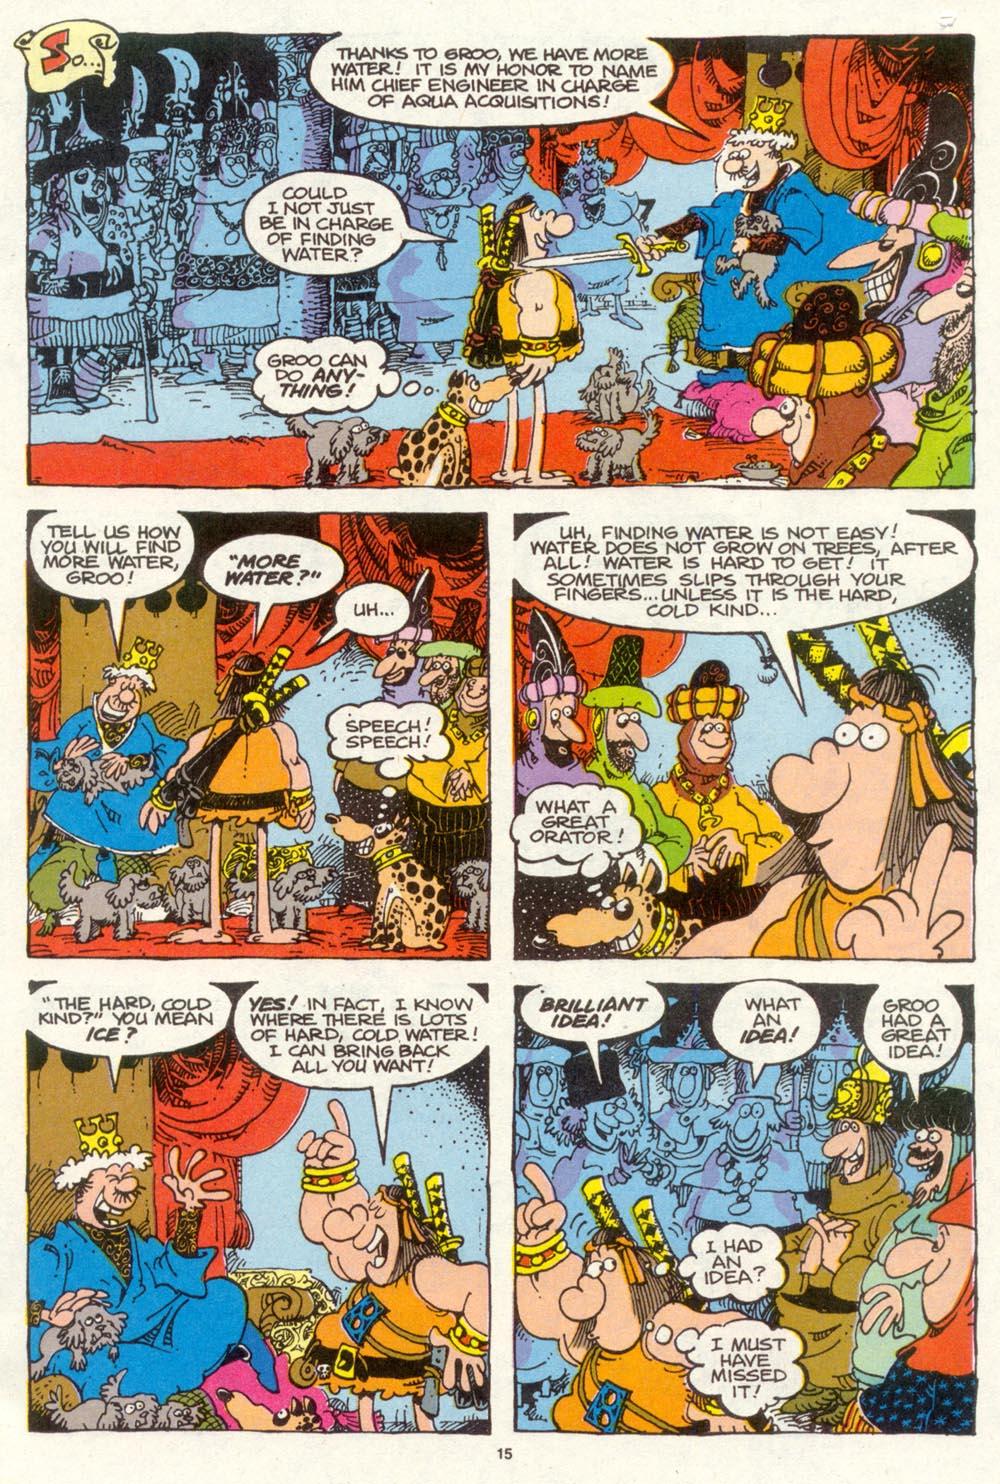 Read online Sergio Aragonés Groo the Wanderer comic -  Issue #94 - 16